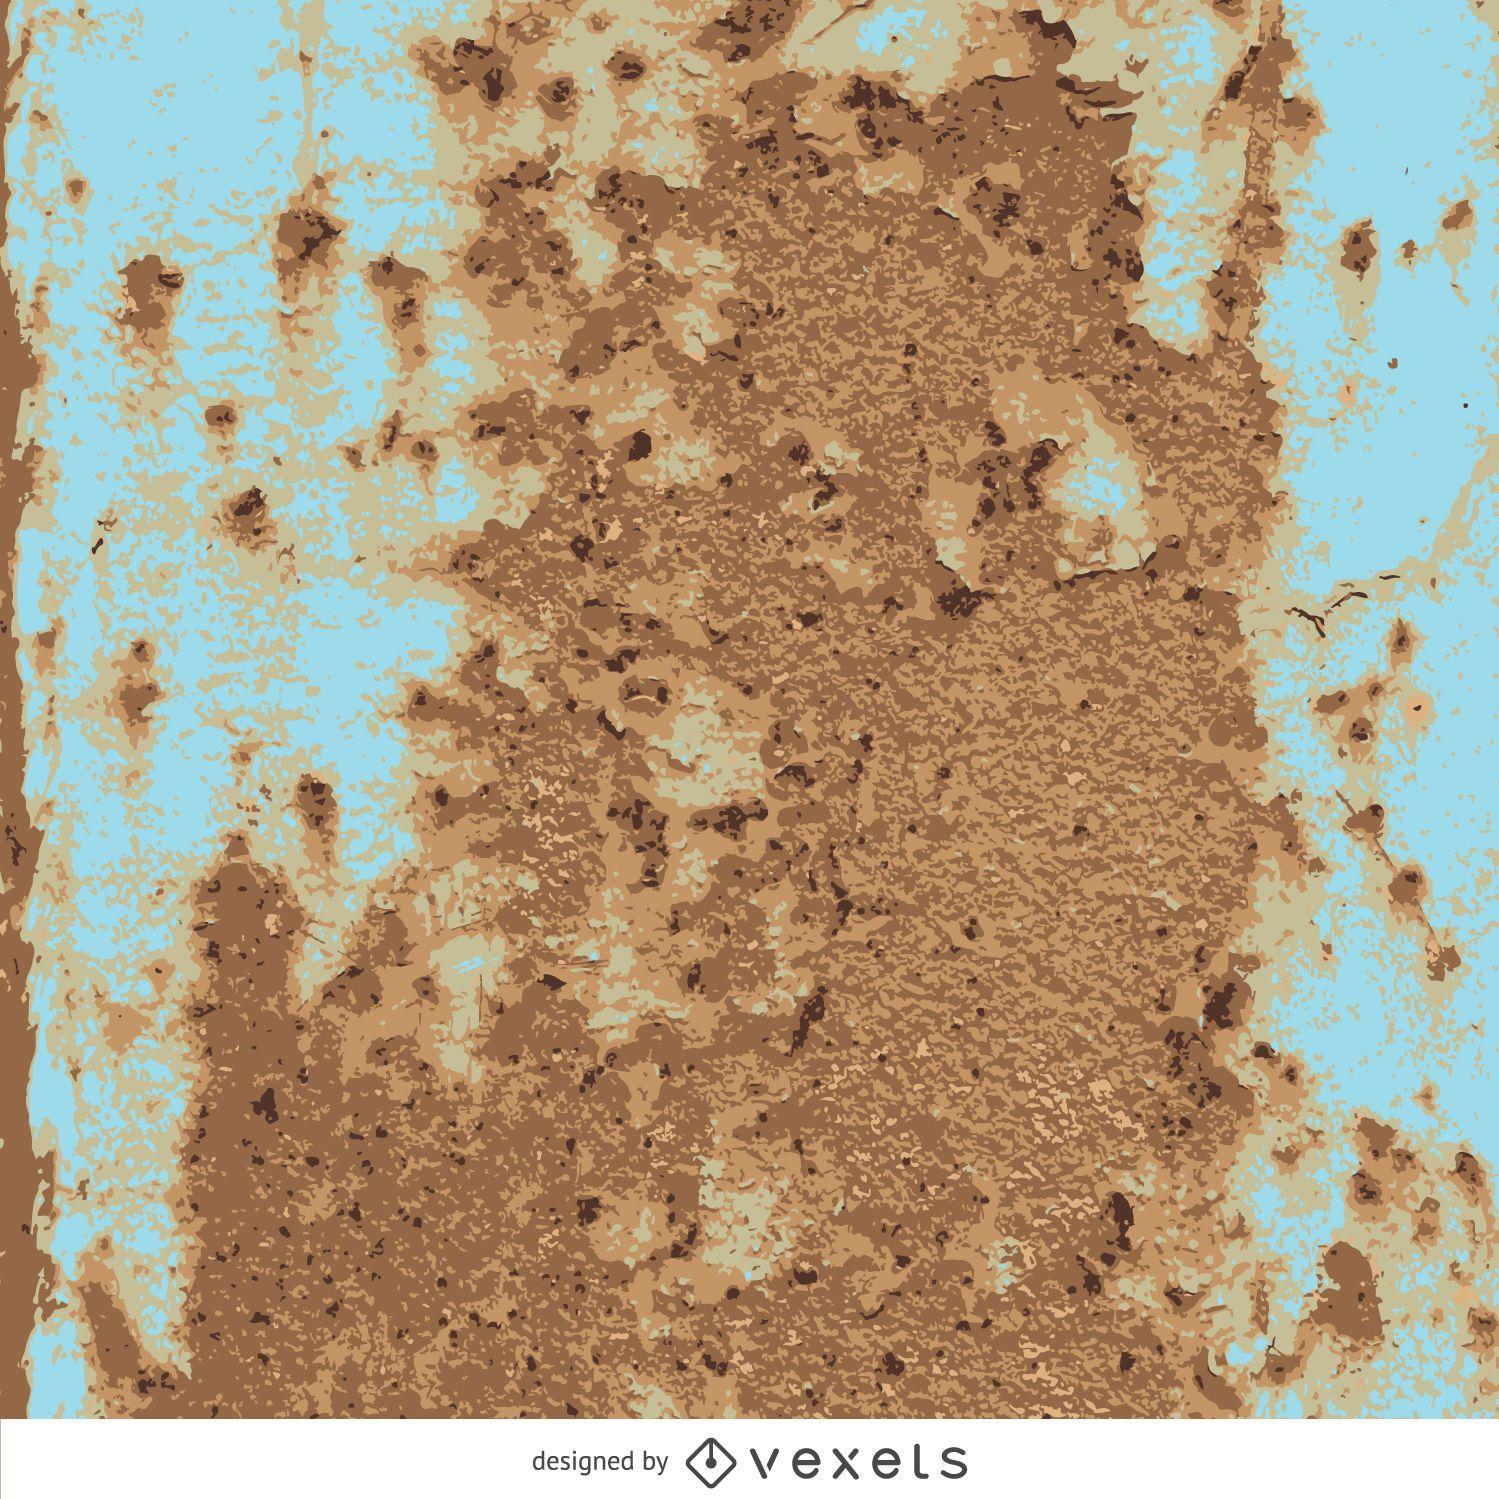 Textura oxidada de metal